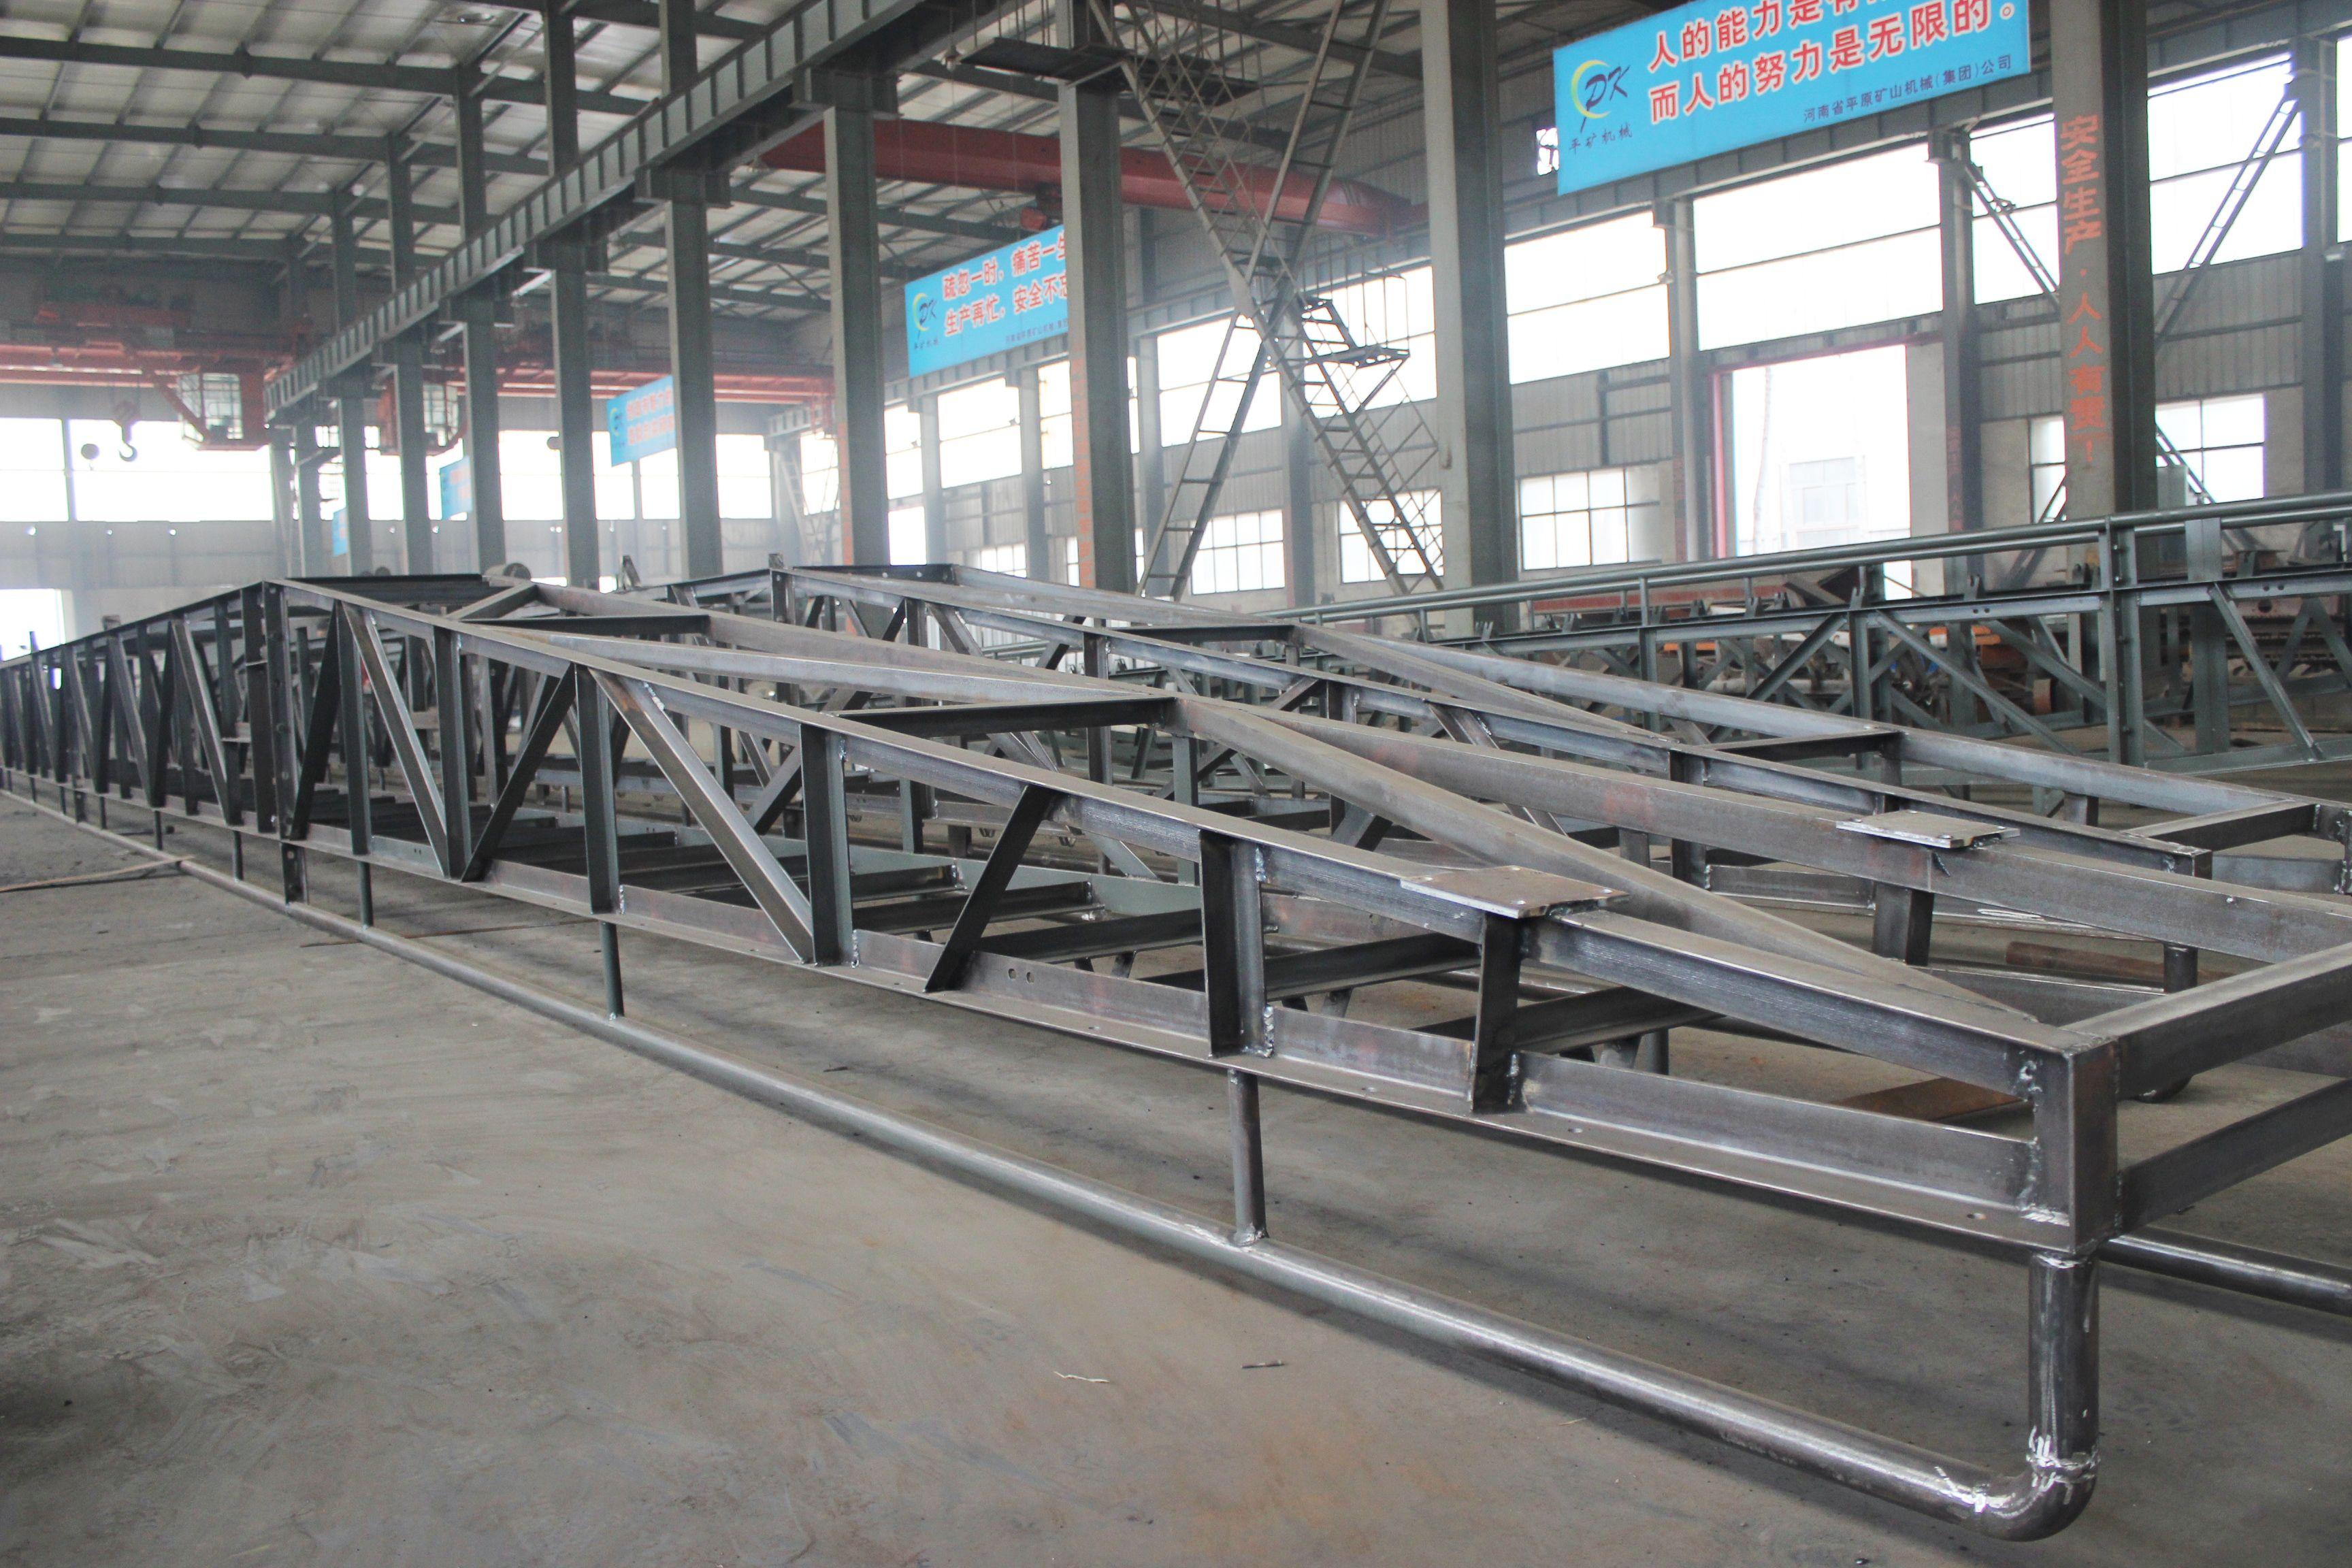 Portable Belt Conveyor | portable belt conveyor in 2019 | Belt